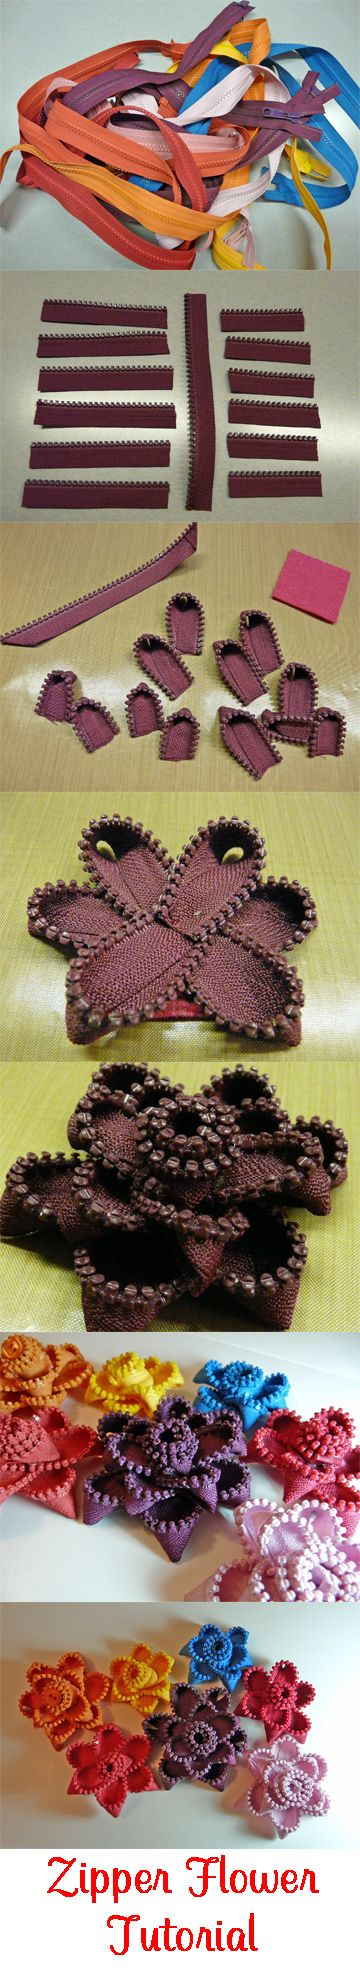 No-Sew Zipper Flower Tutorial from CardsByStephanie.com: